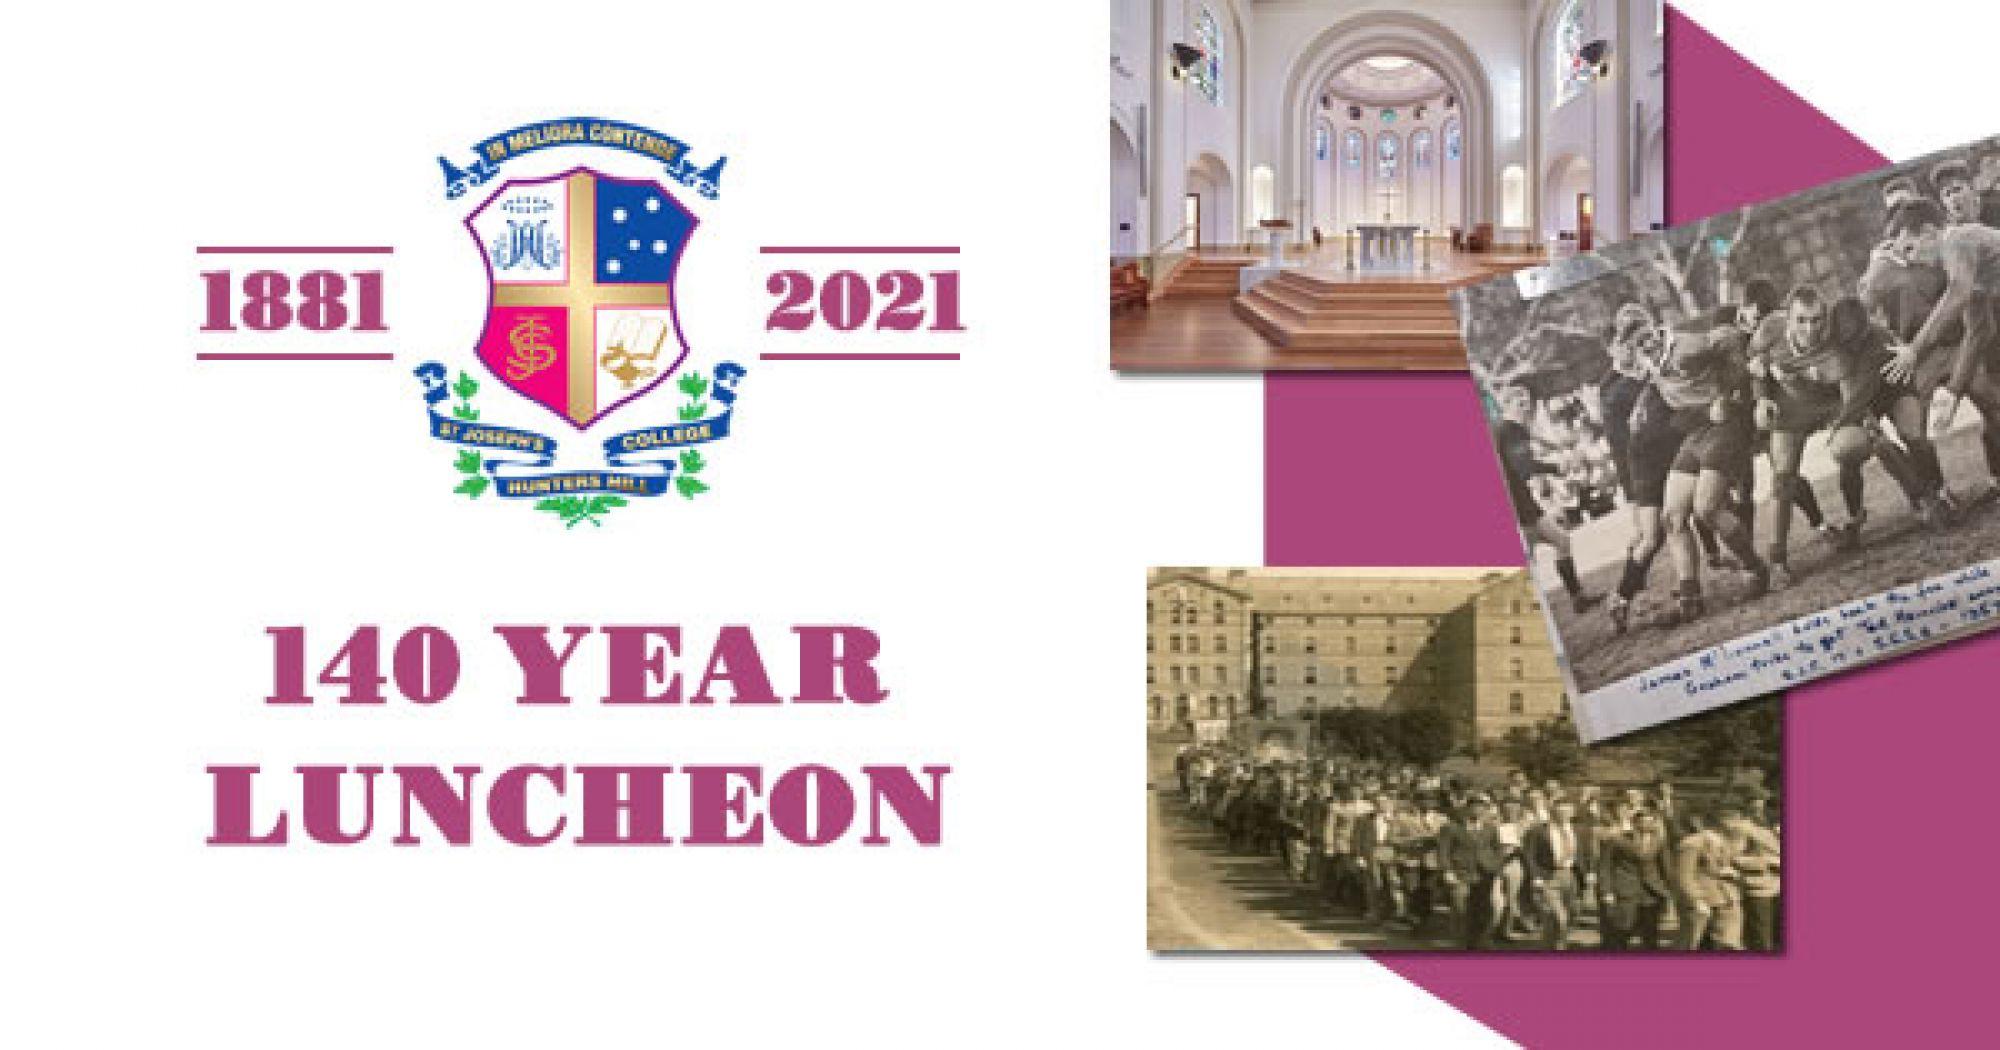 SJC 140 Year Luncheon